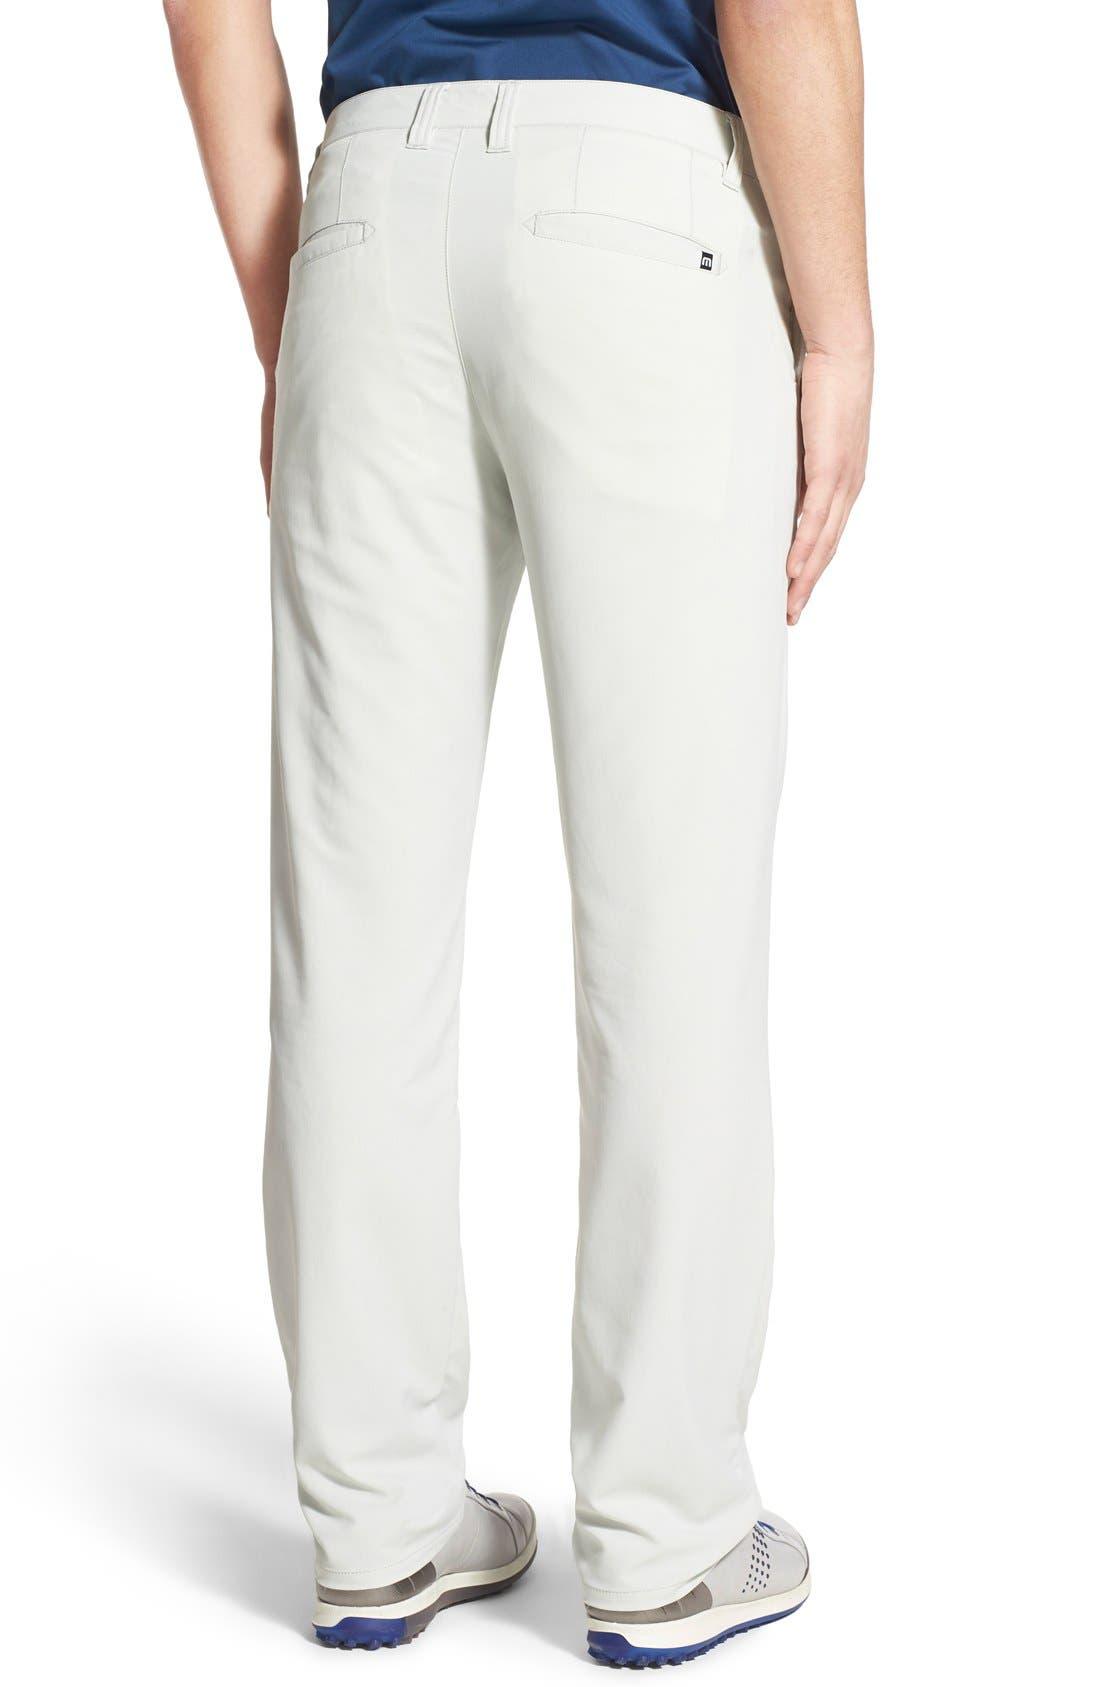 'Hough' Trim Fit Golf Pants,                             Alternate thumbnail 2, color,                             Dawn Blue/ Grey